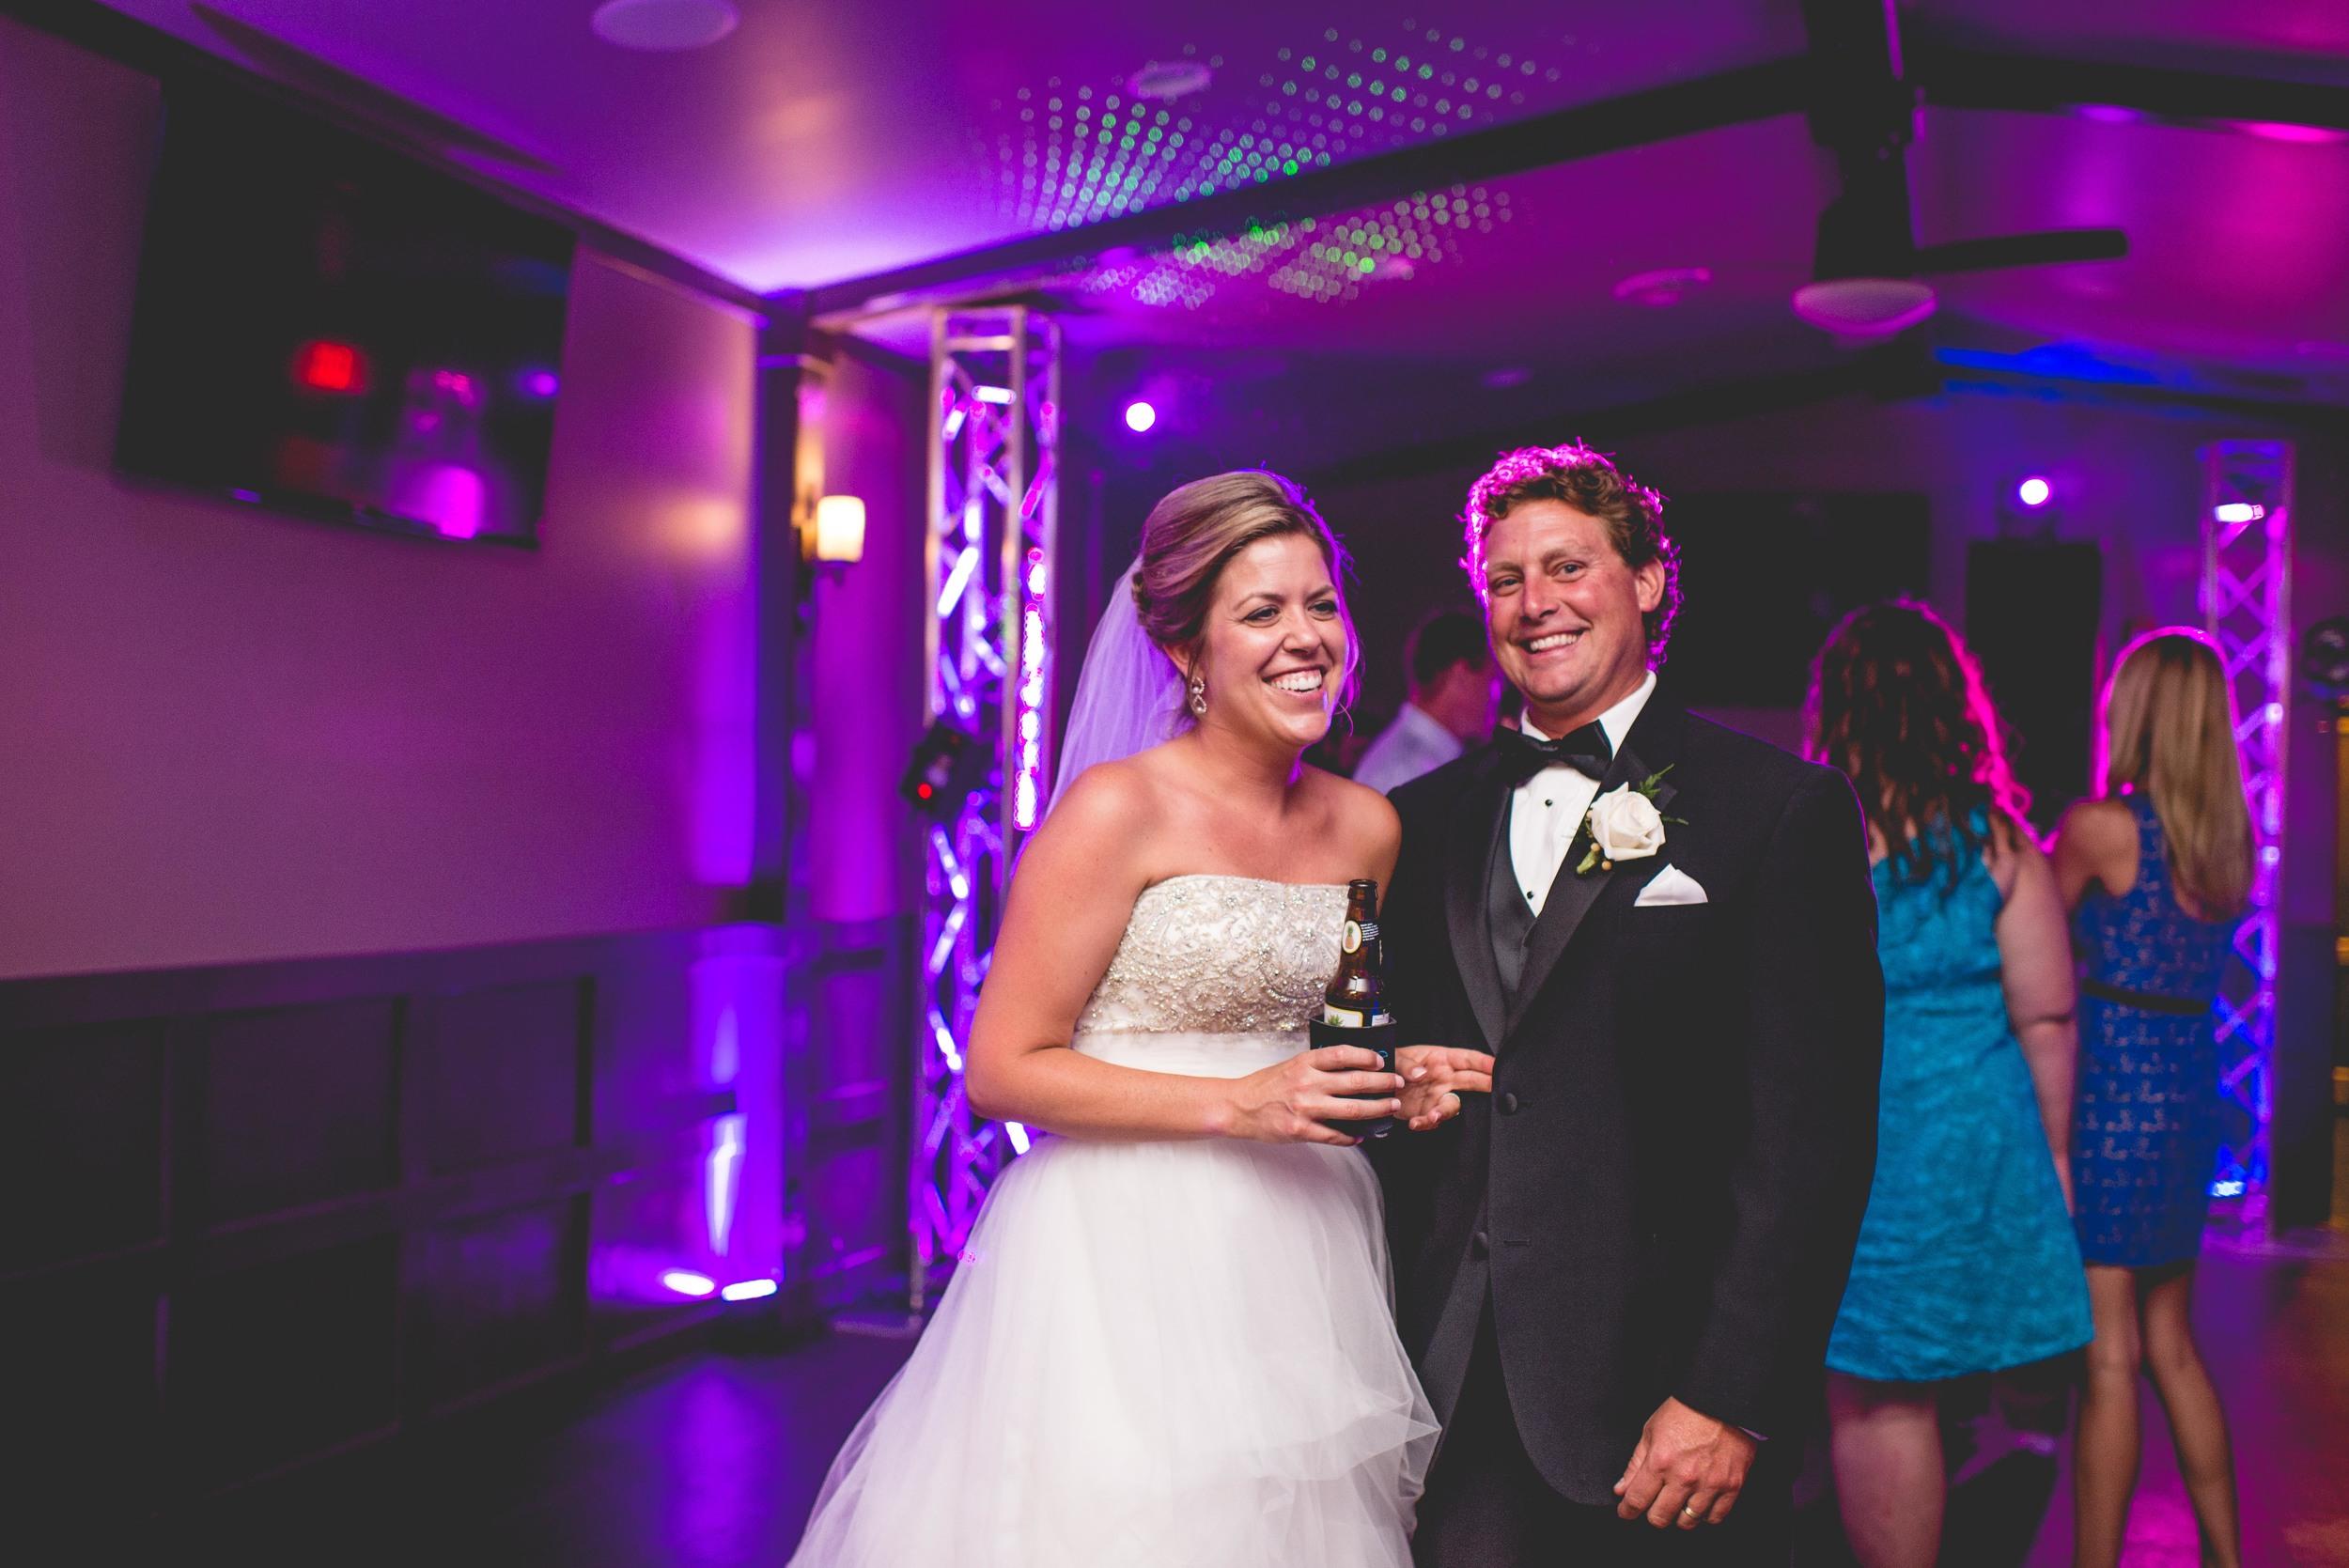 sarasutterphotography_leeandshalon_wedding_2015-767.jpg